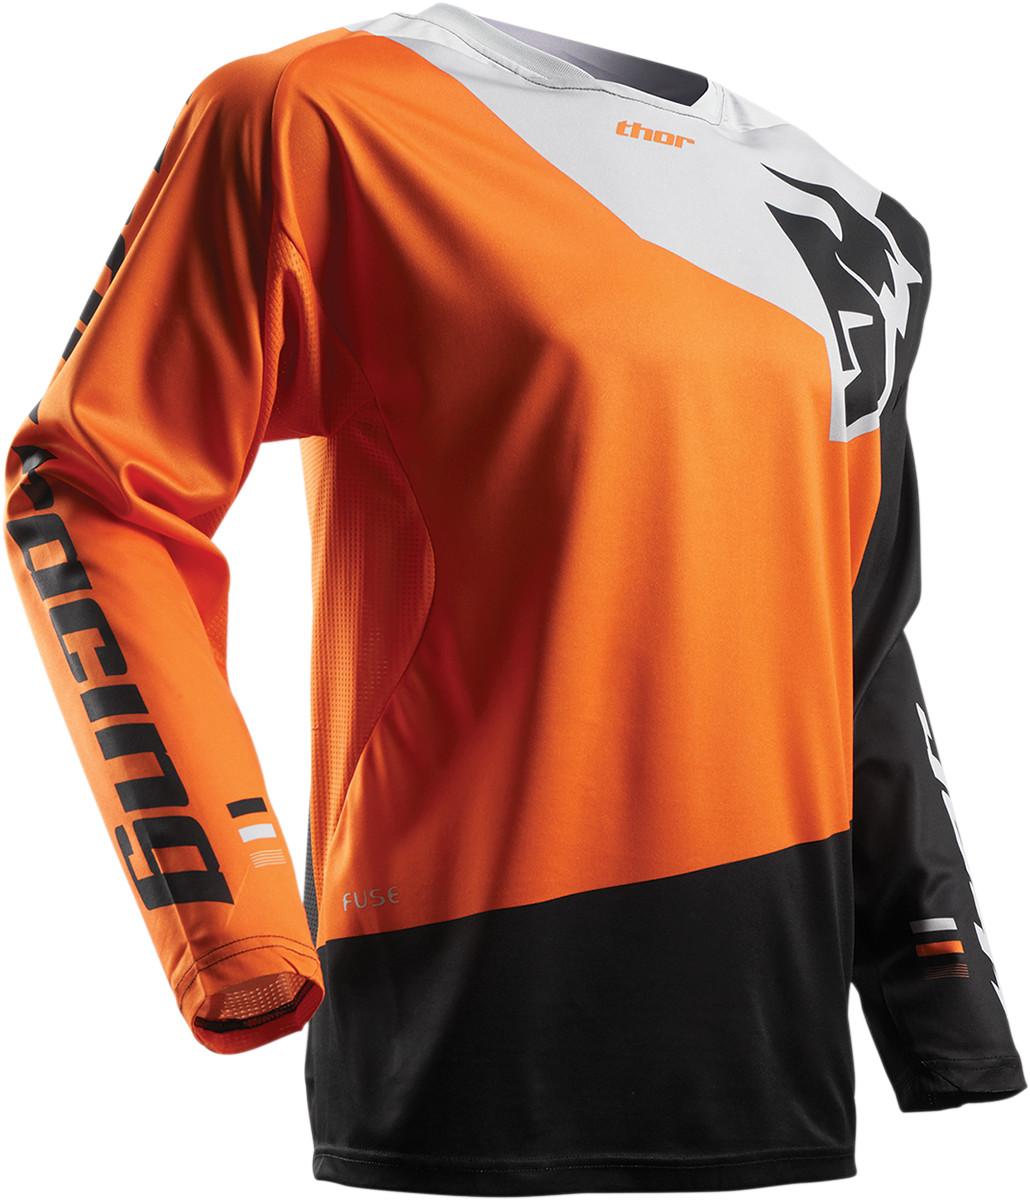 Orange/Black JerseyThor Fuse Pinin